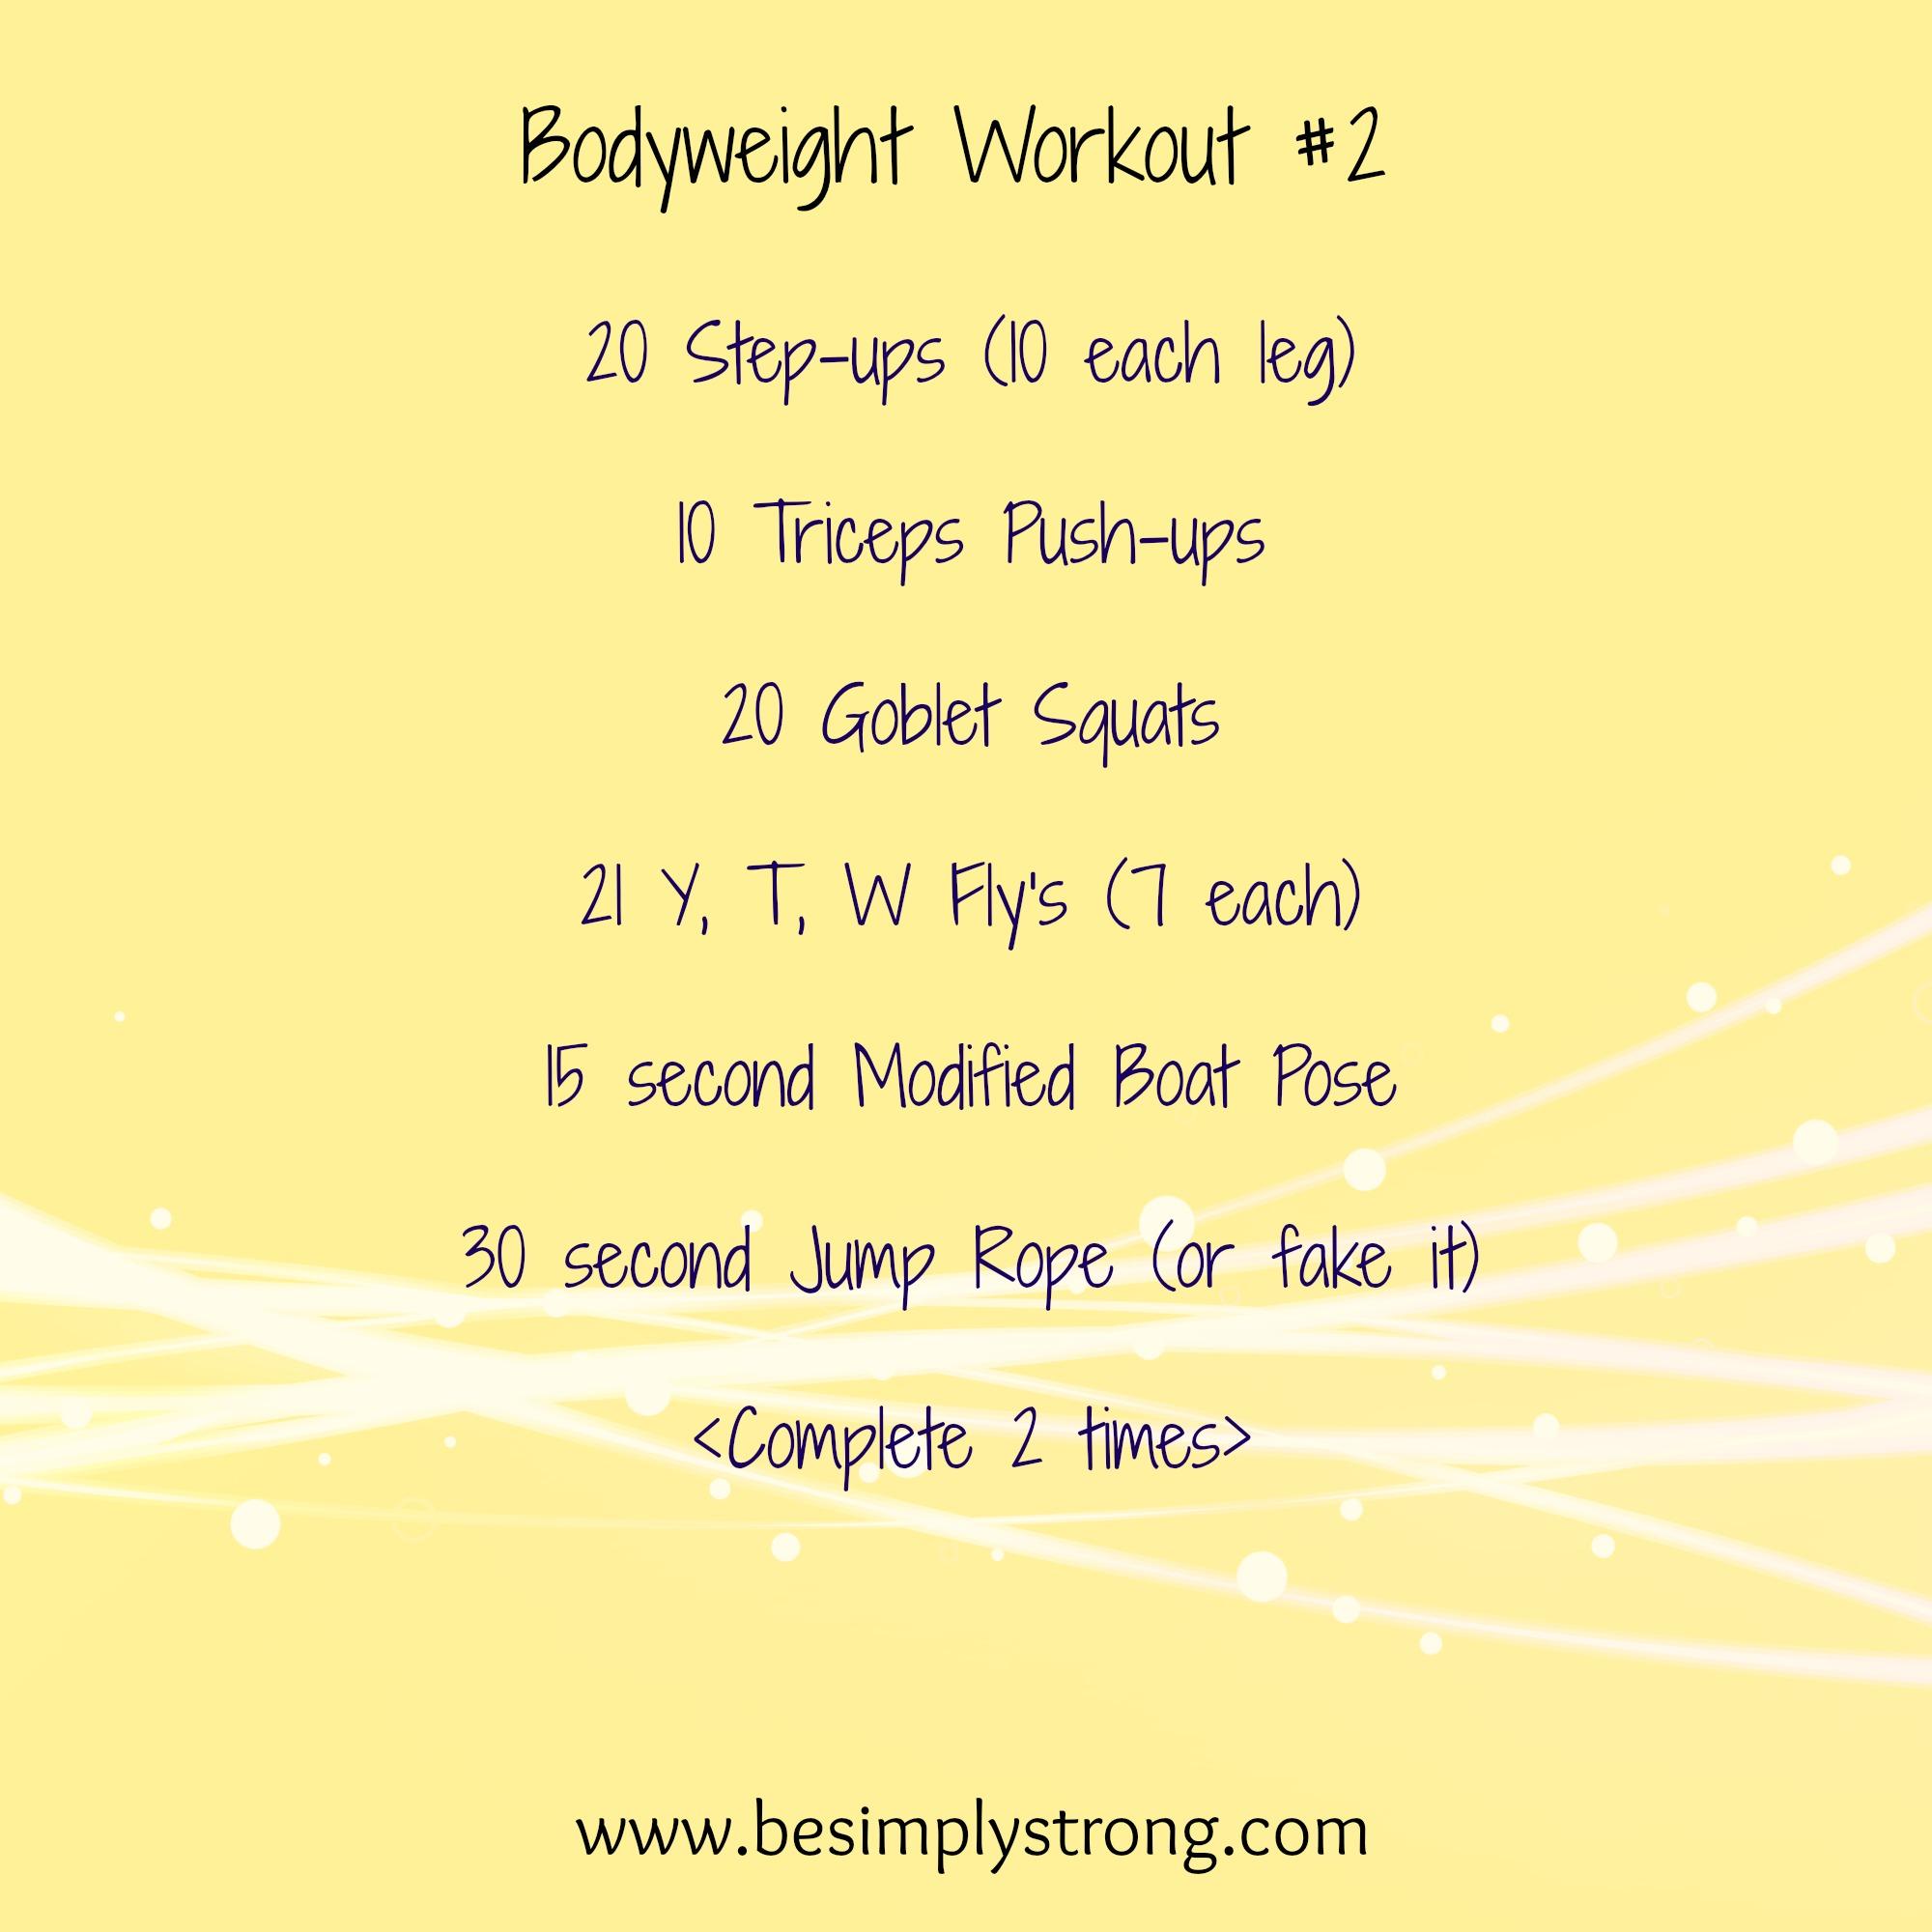 Workout Wed_bodyweight workout 2.jpg